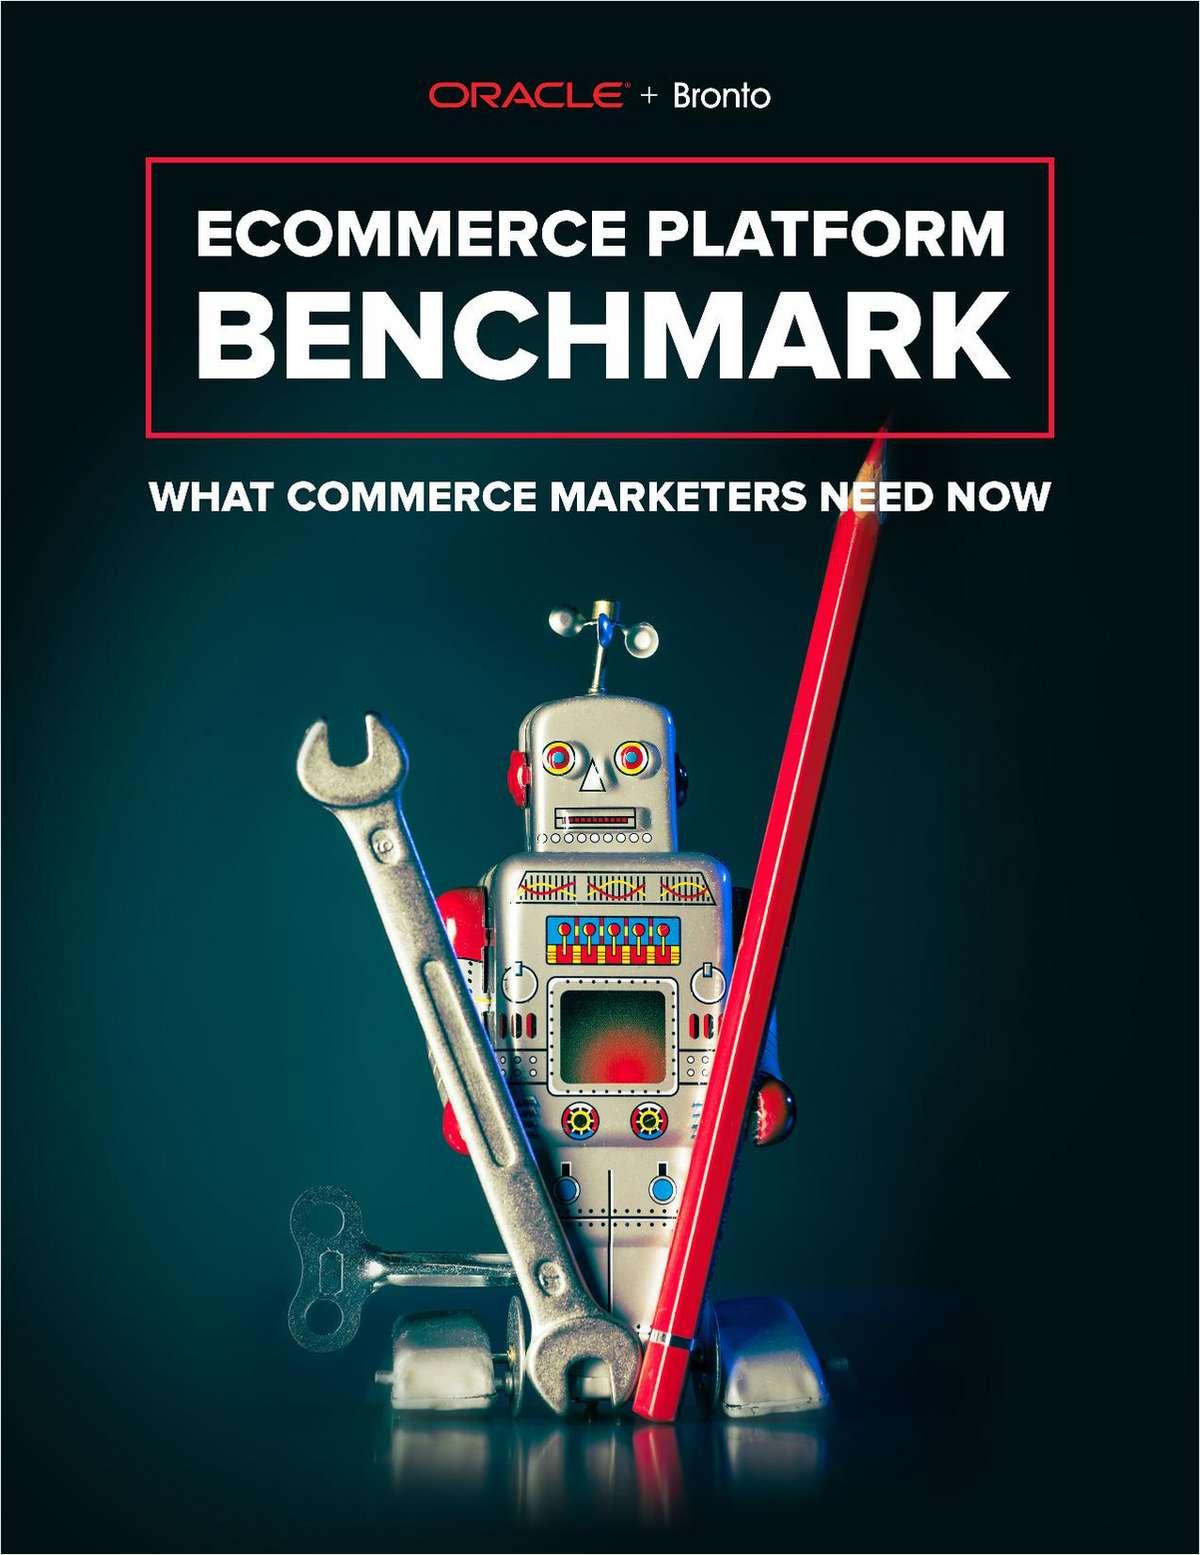 Ecommerce Platform Benchmark